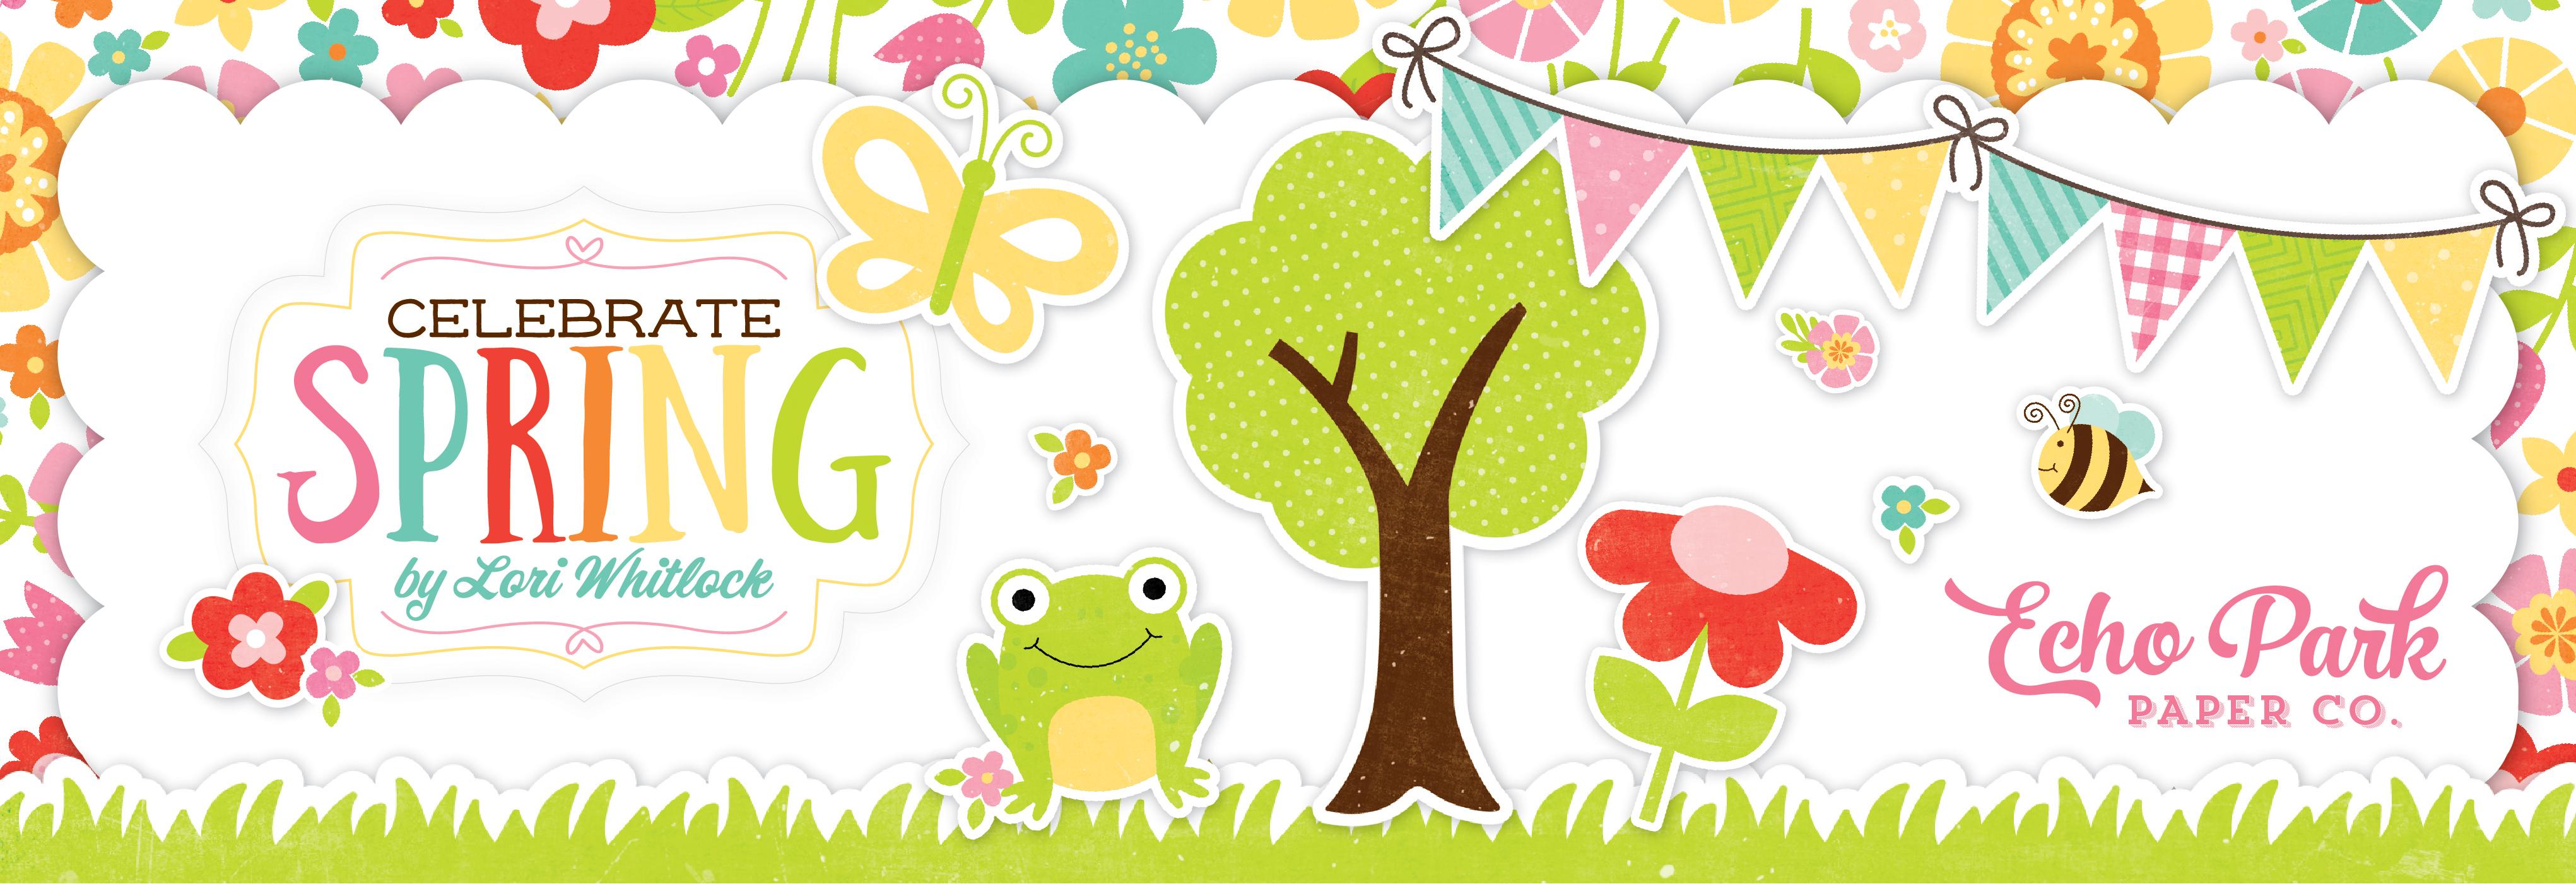 -snapclick-spring17-ep-banner.jpg